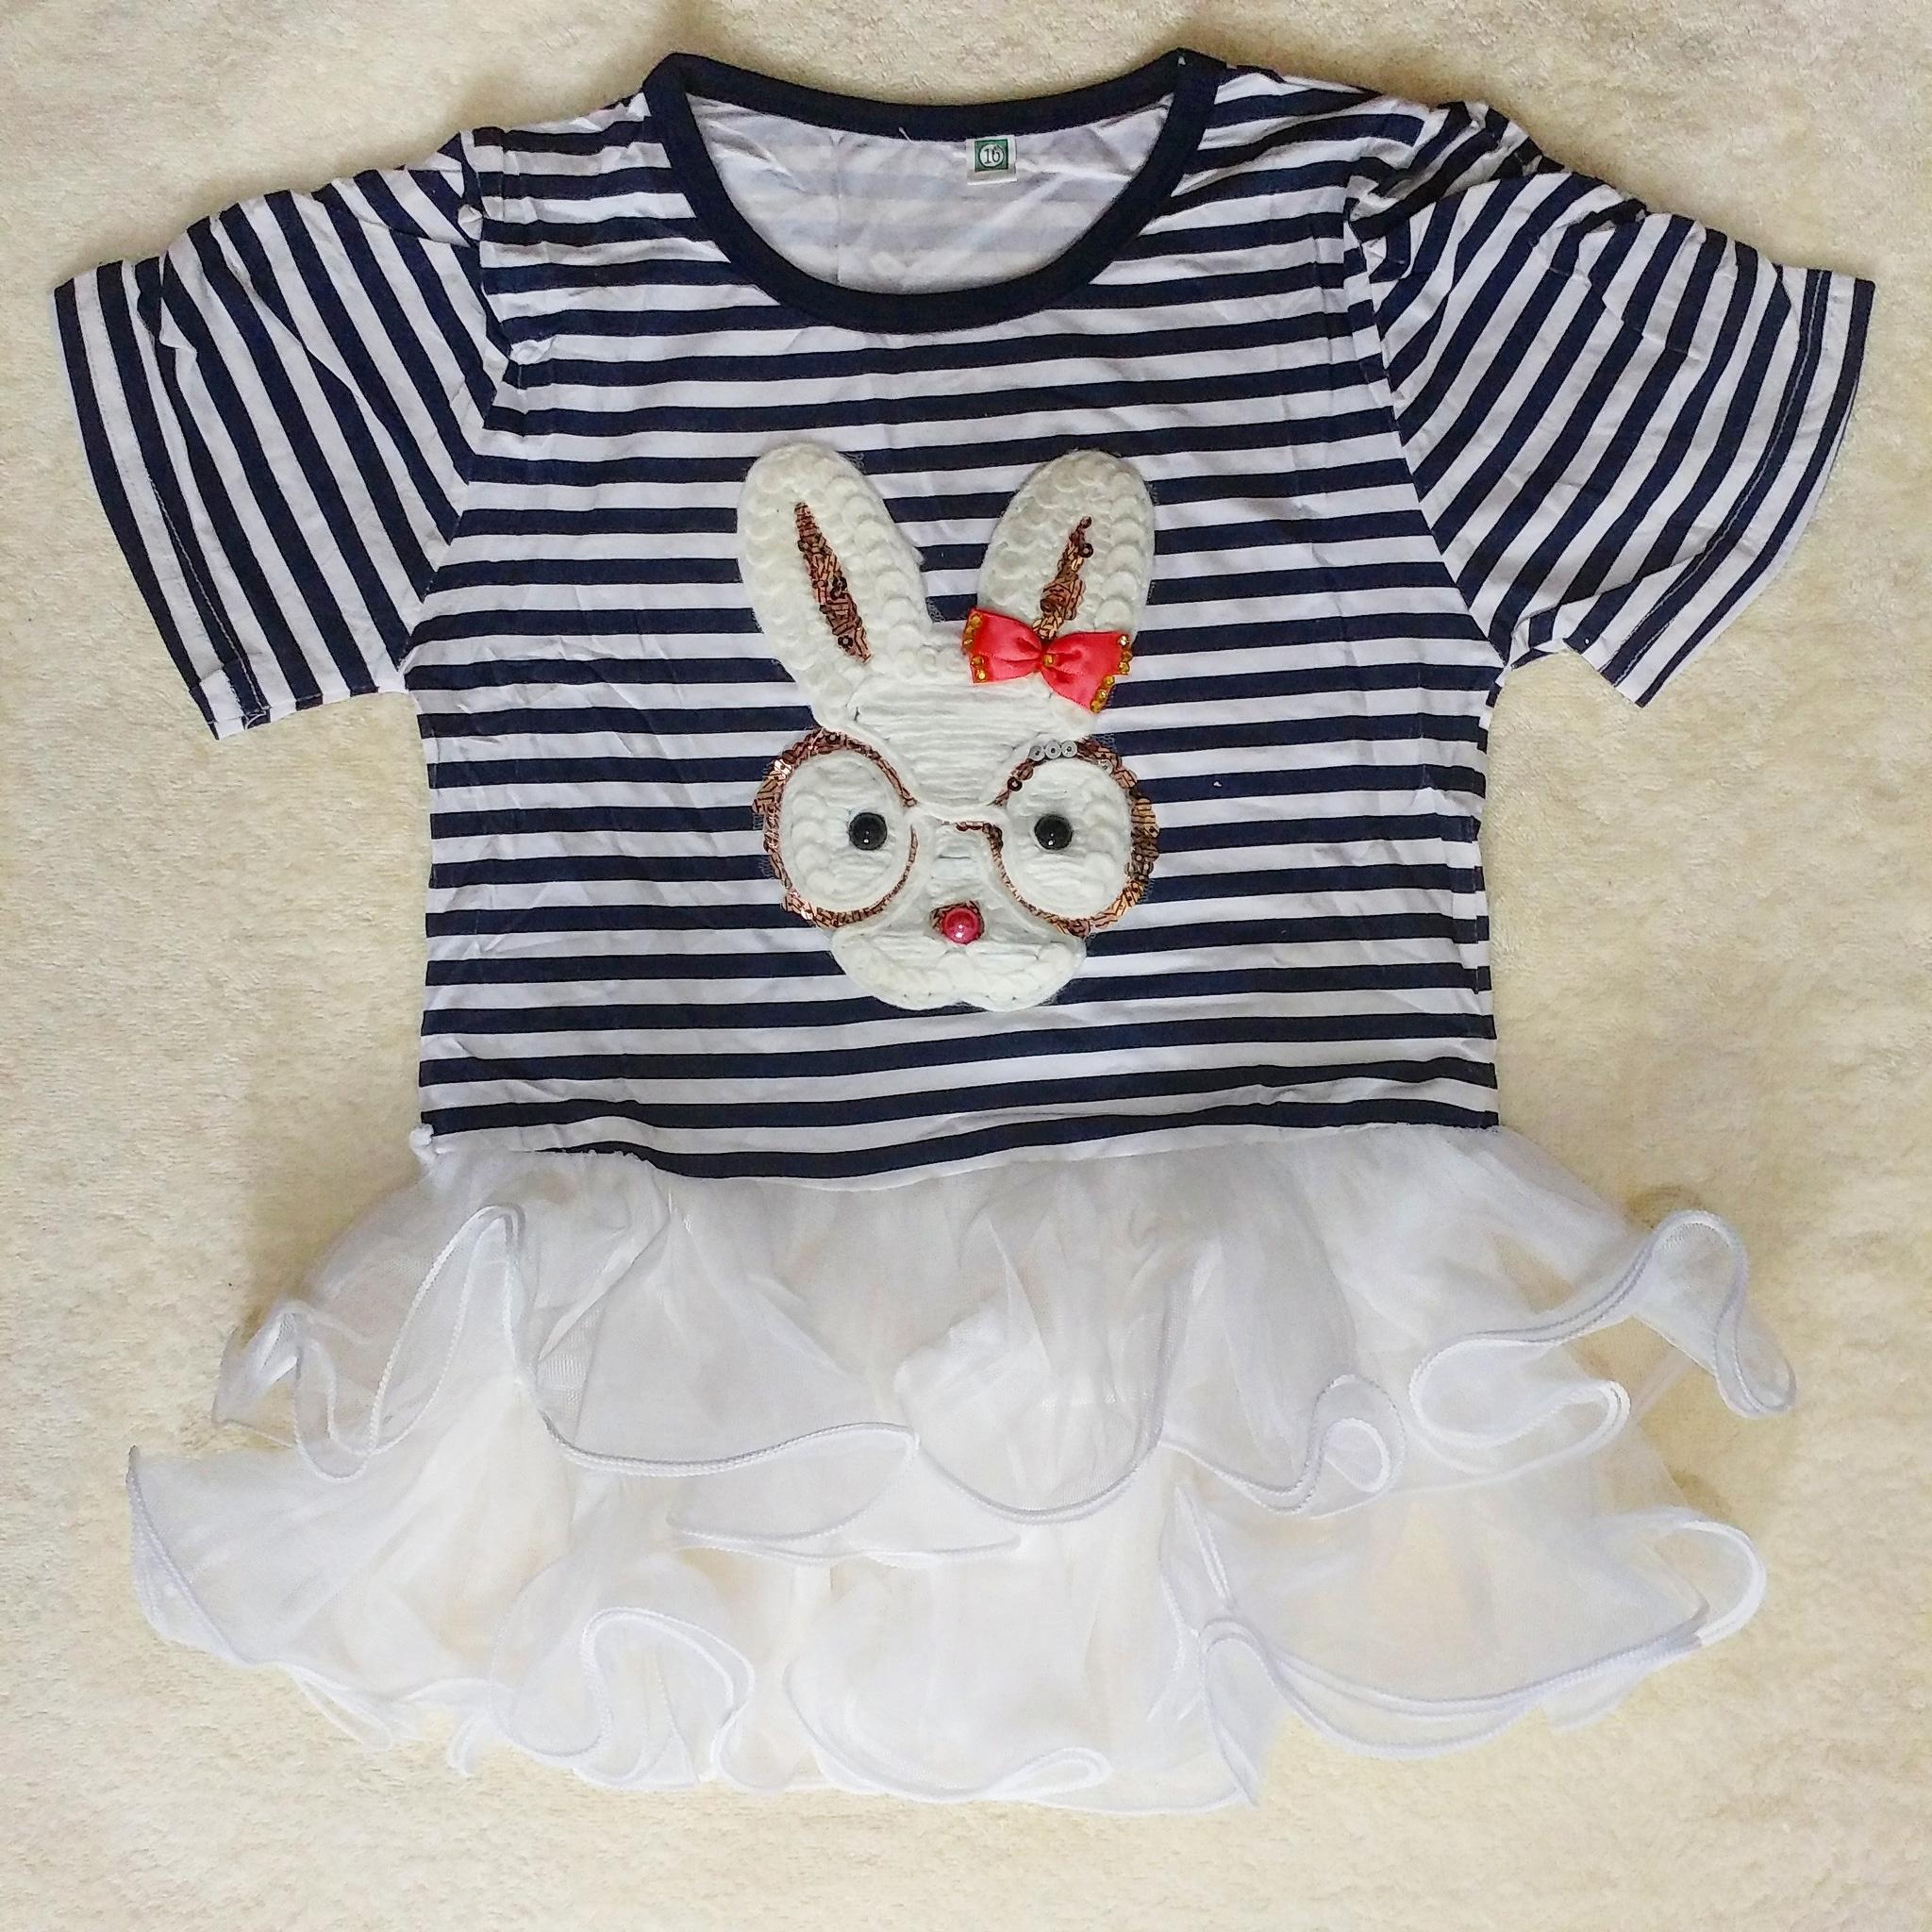 Jual Dress Tutu Baby Bayi Import Premium Quality Rattle Hey Pop Out Bunny Tee Kaos Anak